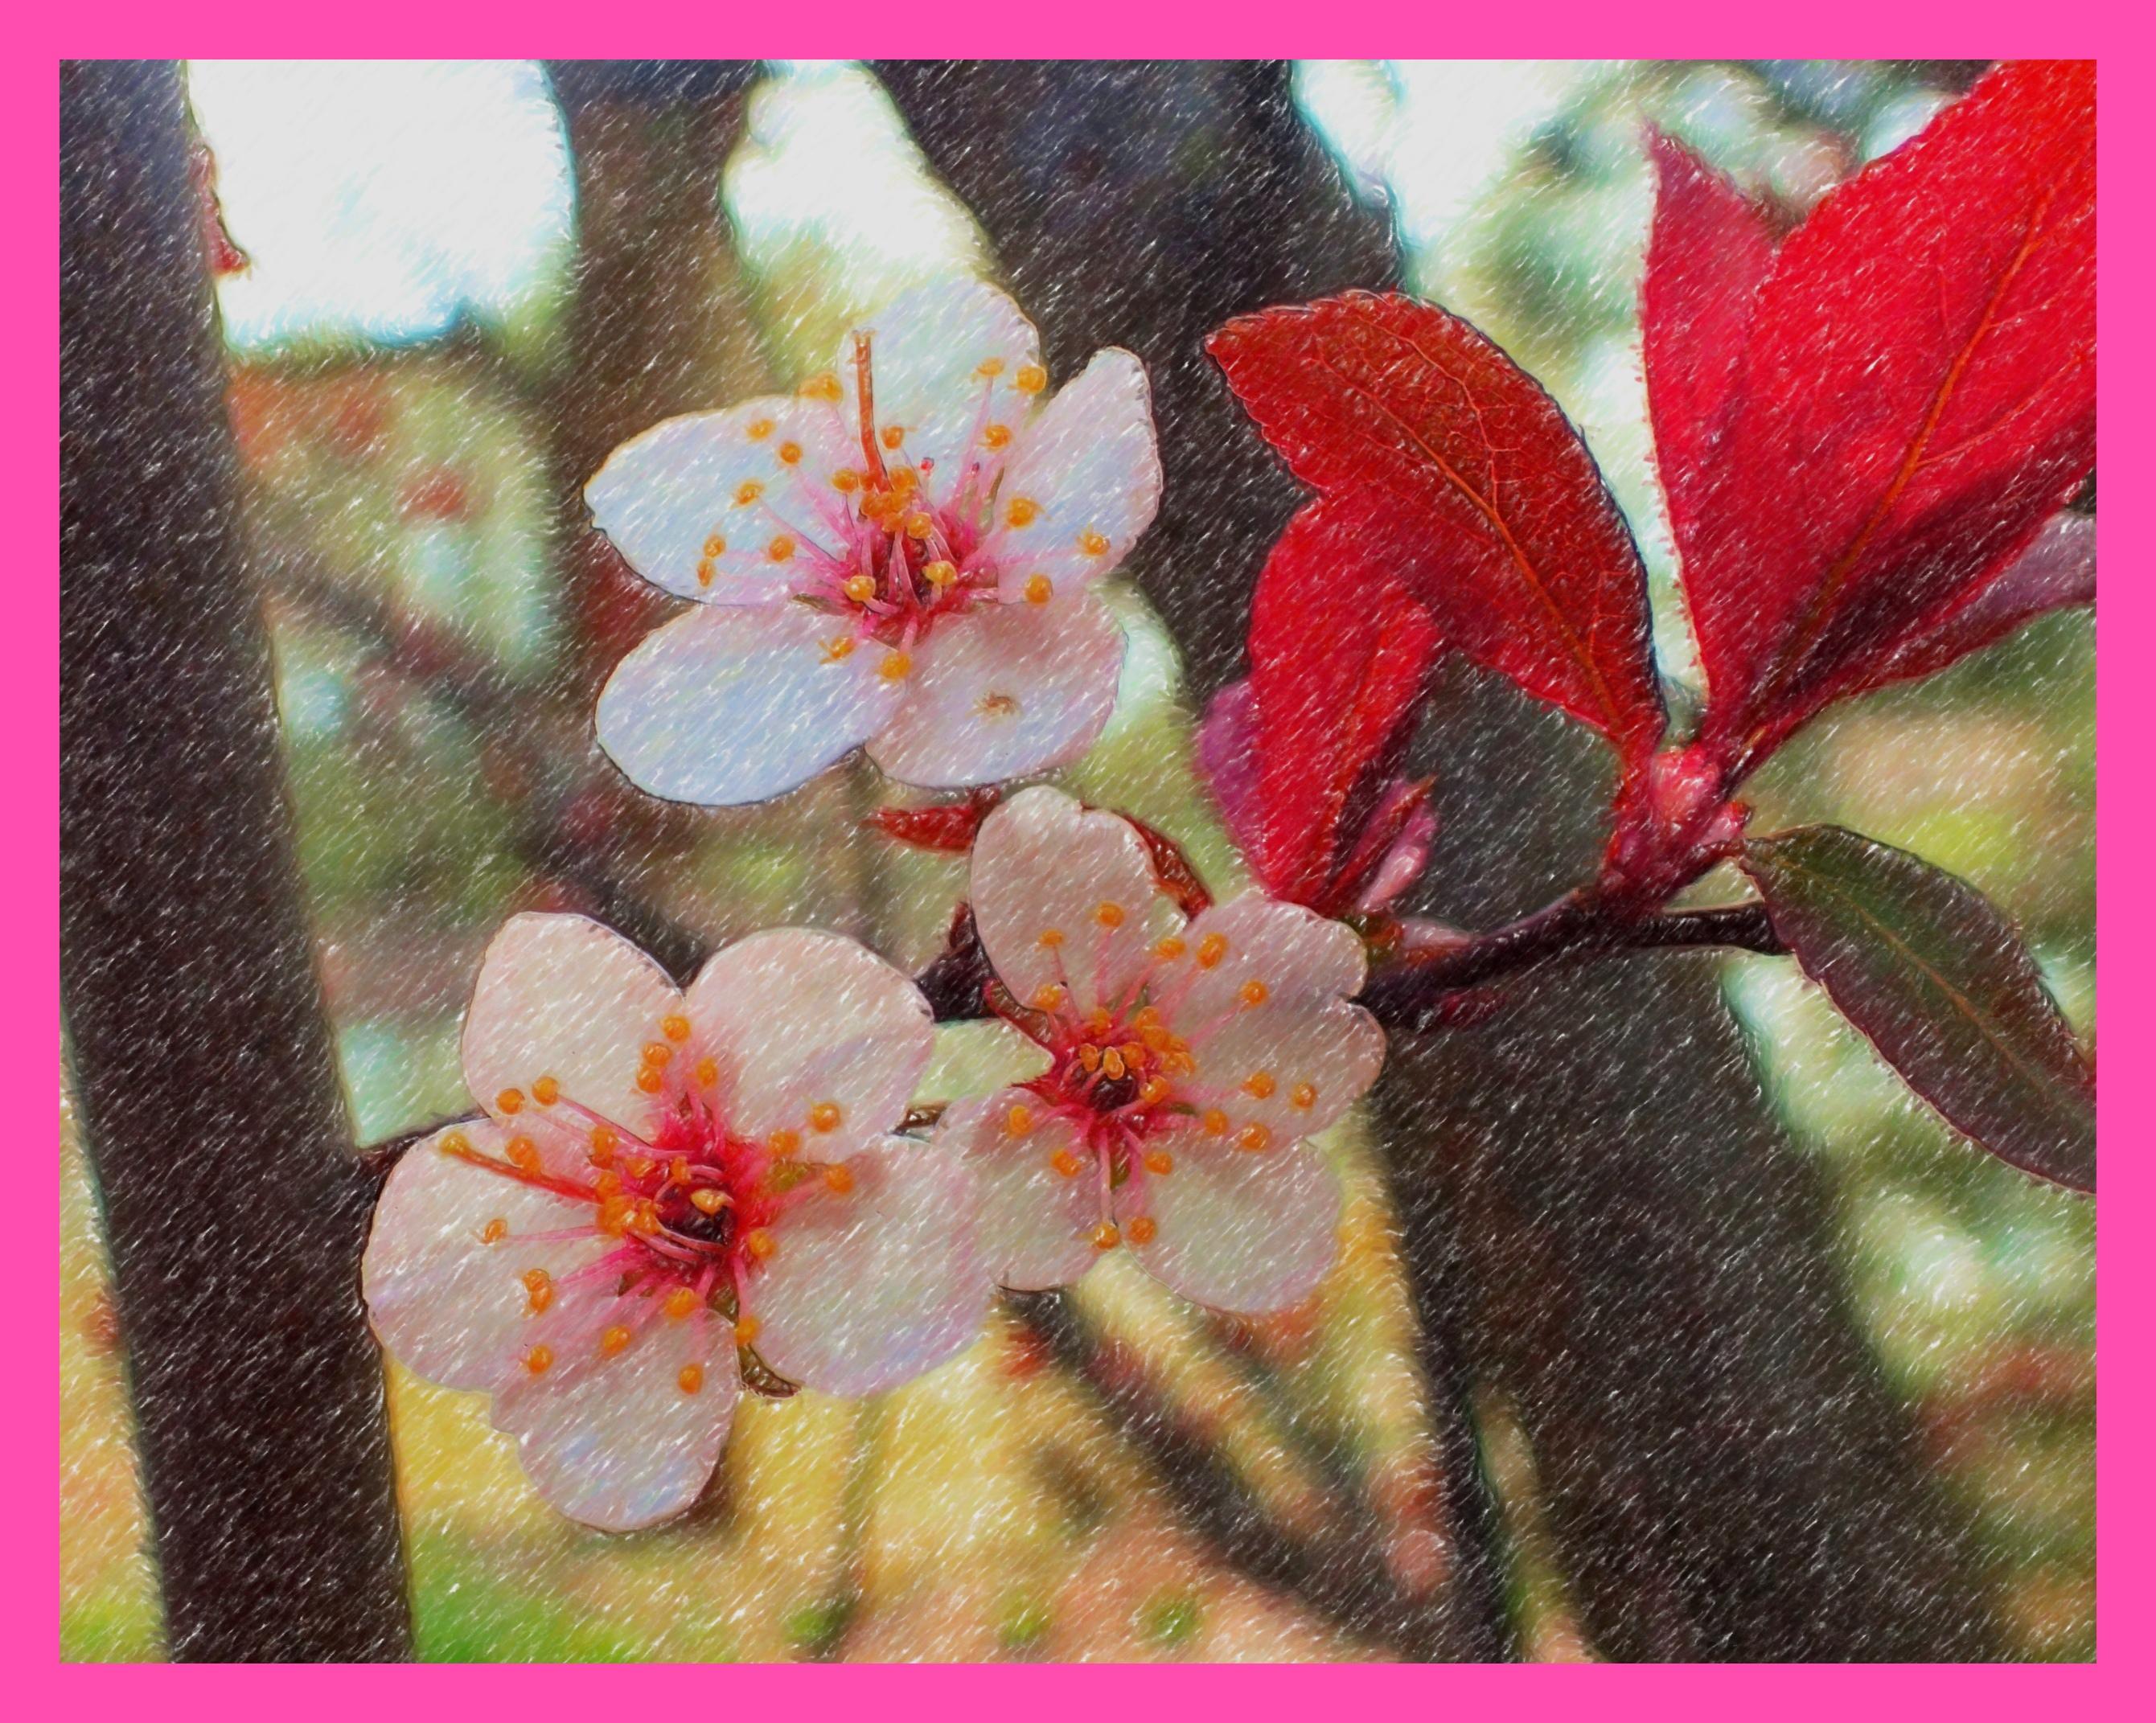 Plum Tree Blossoms. (2) (Digital Color Pencil Rendition) Photo by Thomas Peace c. 2015